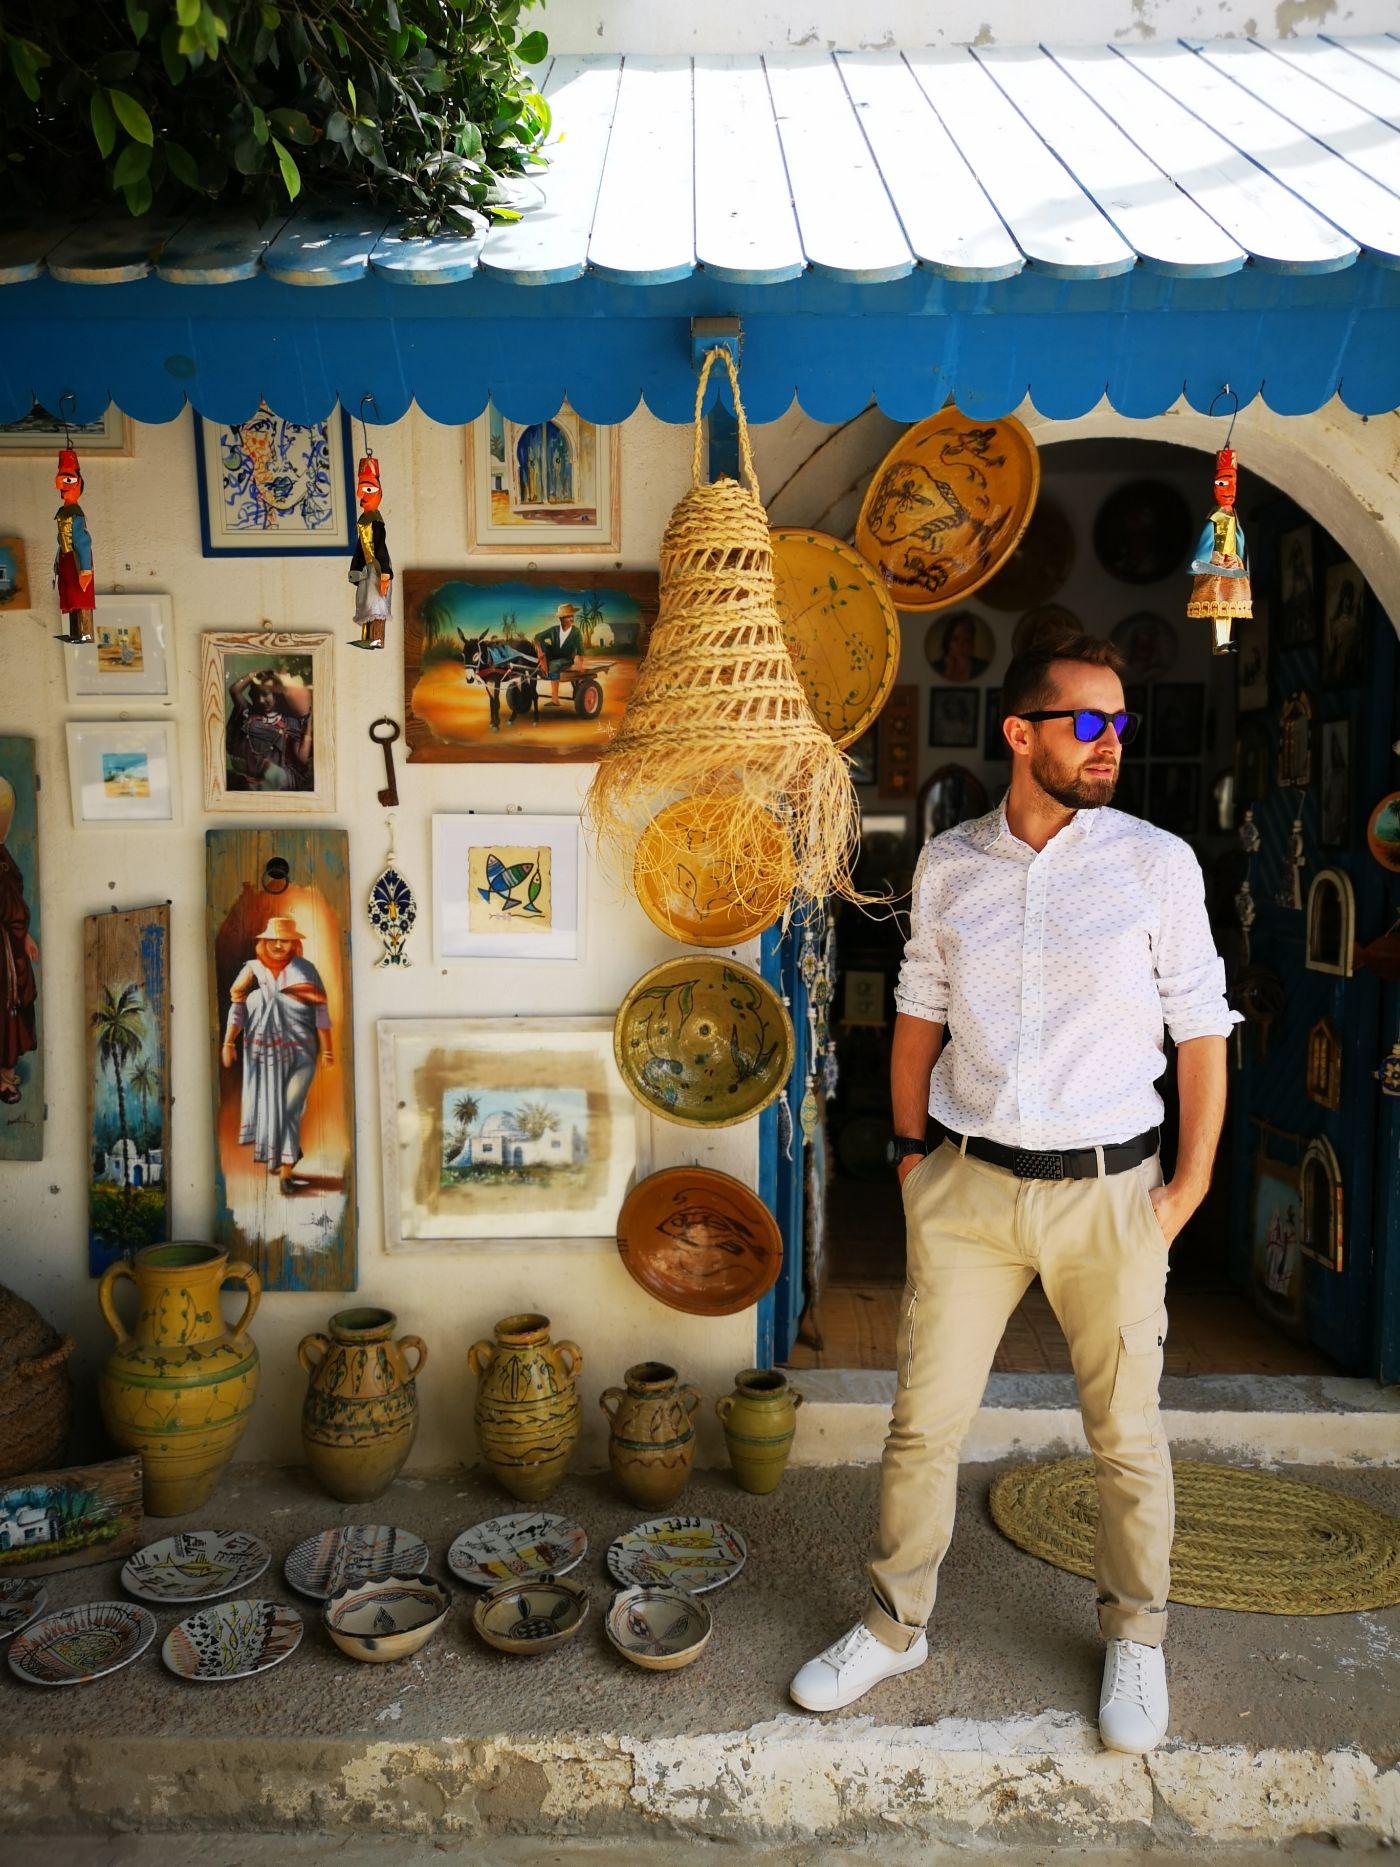 Djerbahood drzwi djerba tunezja model